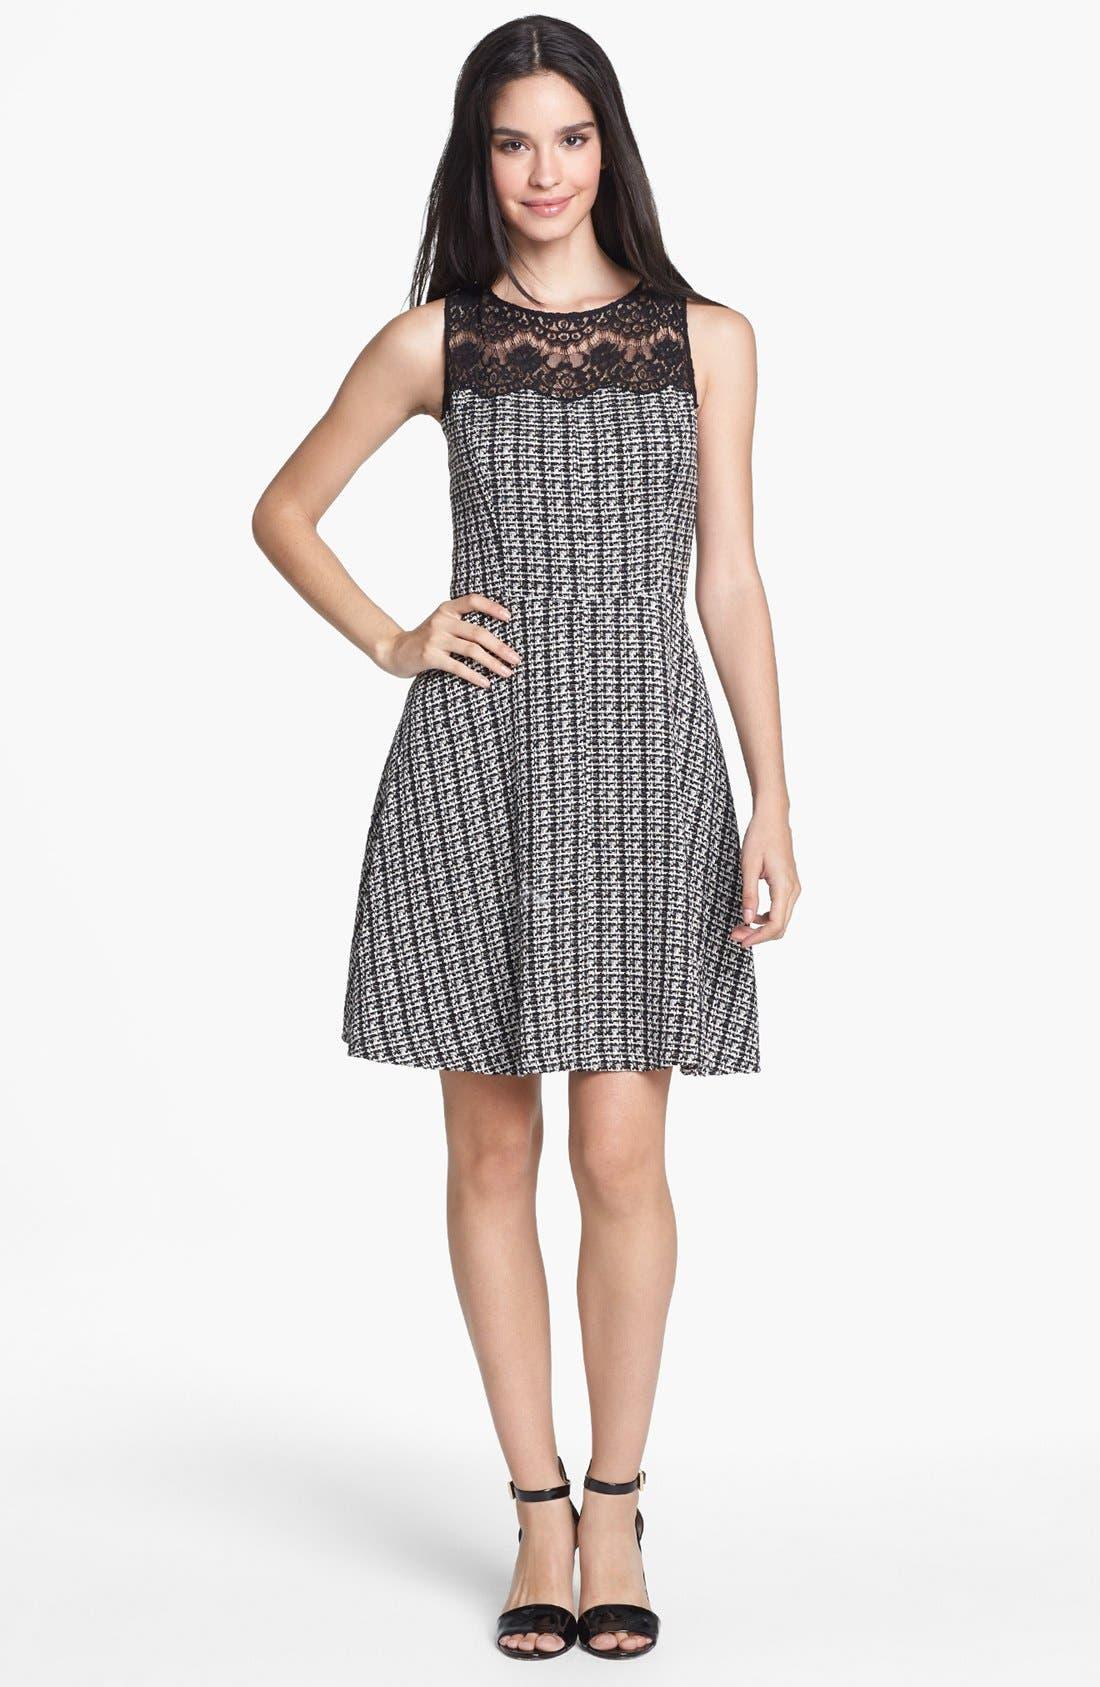 Alternate Image 1 Selected - Jessica Simpson Lace Yoke Bouclé Fit & Flare Dress